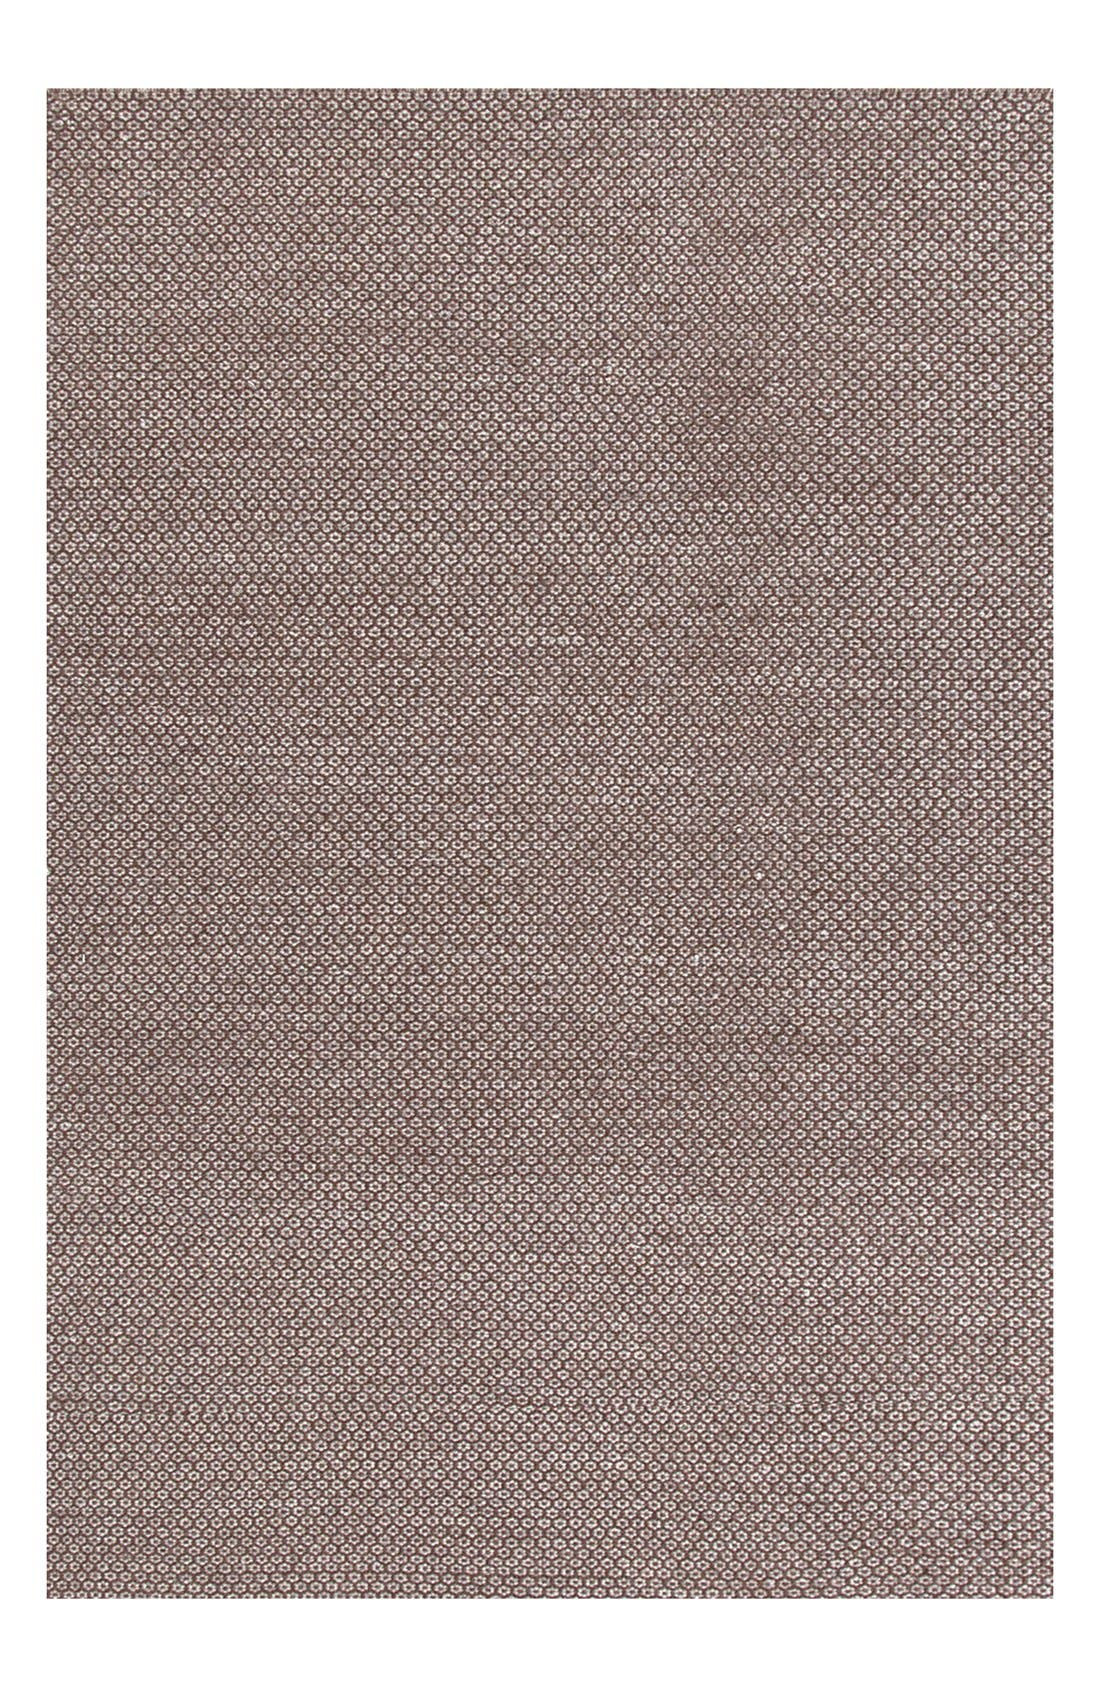 Dash & Albert 'Honeycomb' Wool Rug